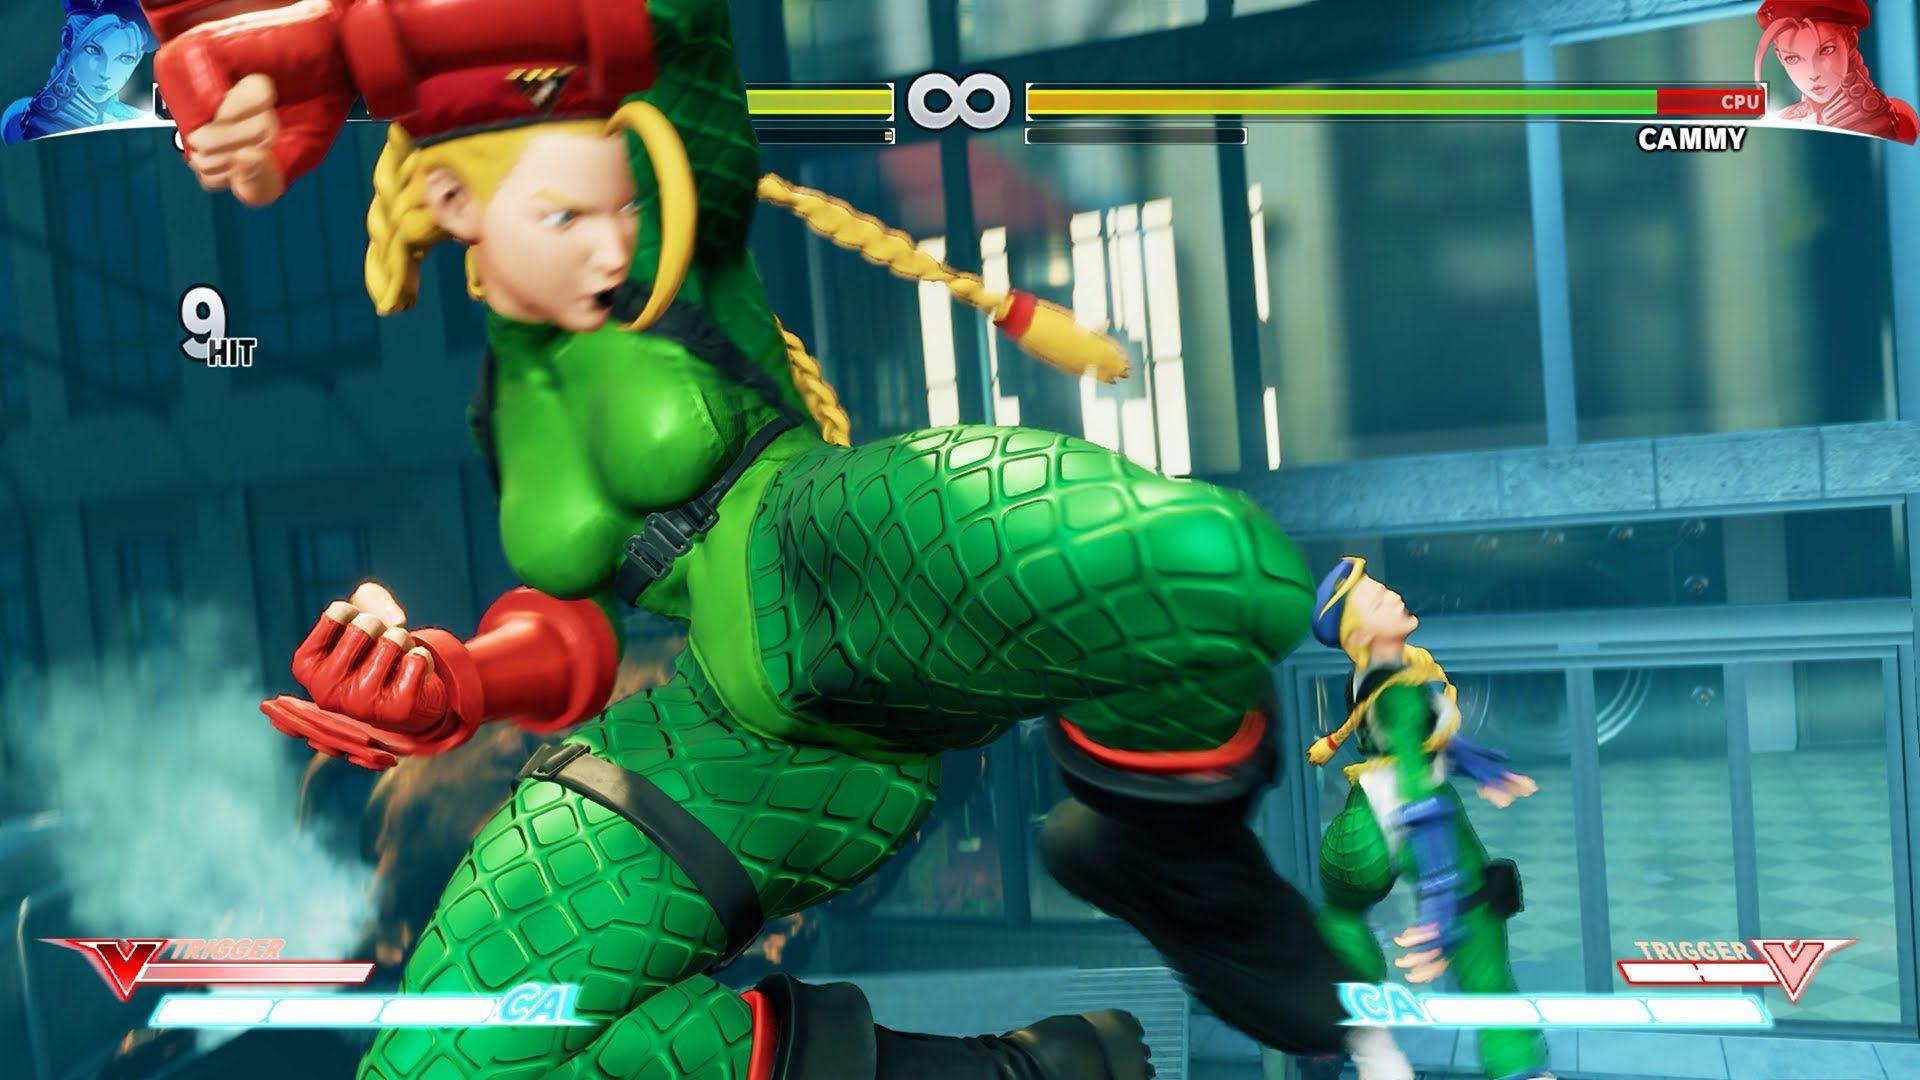 Street Fighter V PC Mod Battle Suit Cammy Costume / Skin